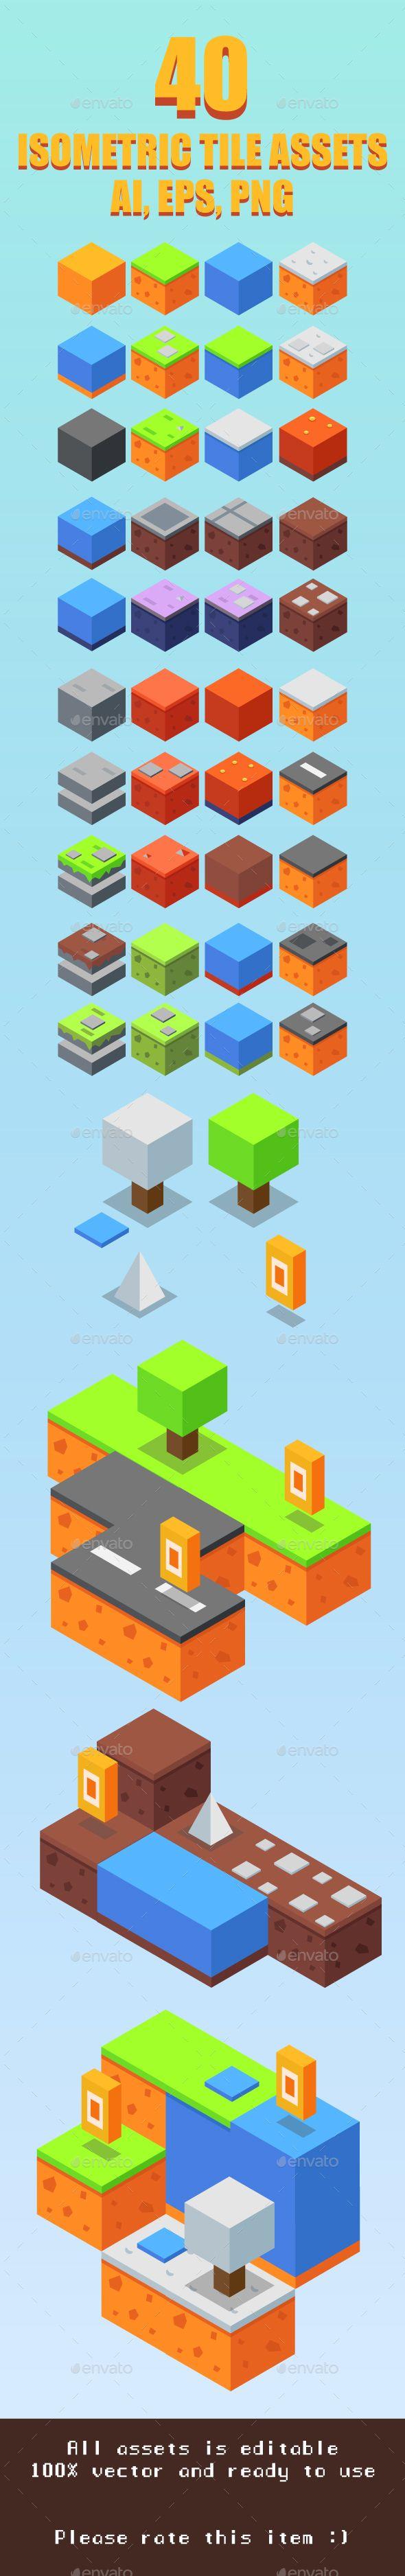 Pin by Bashooka Web & Graphic Design on Pixel Art Game